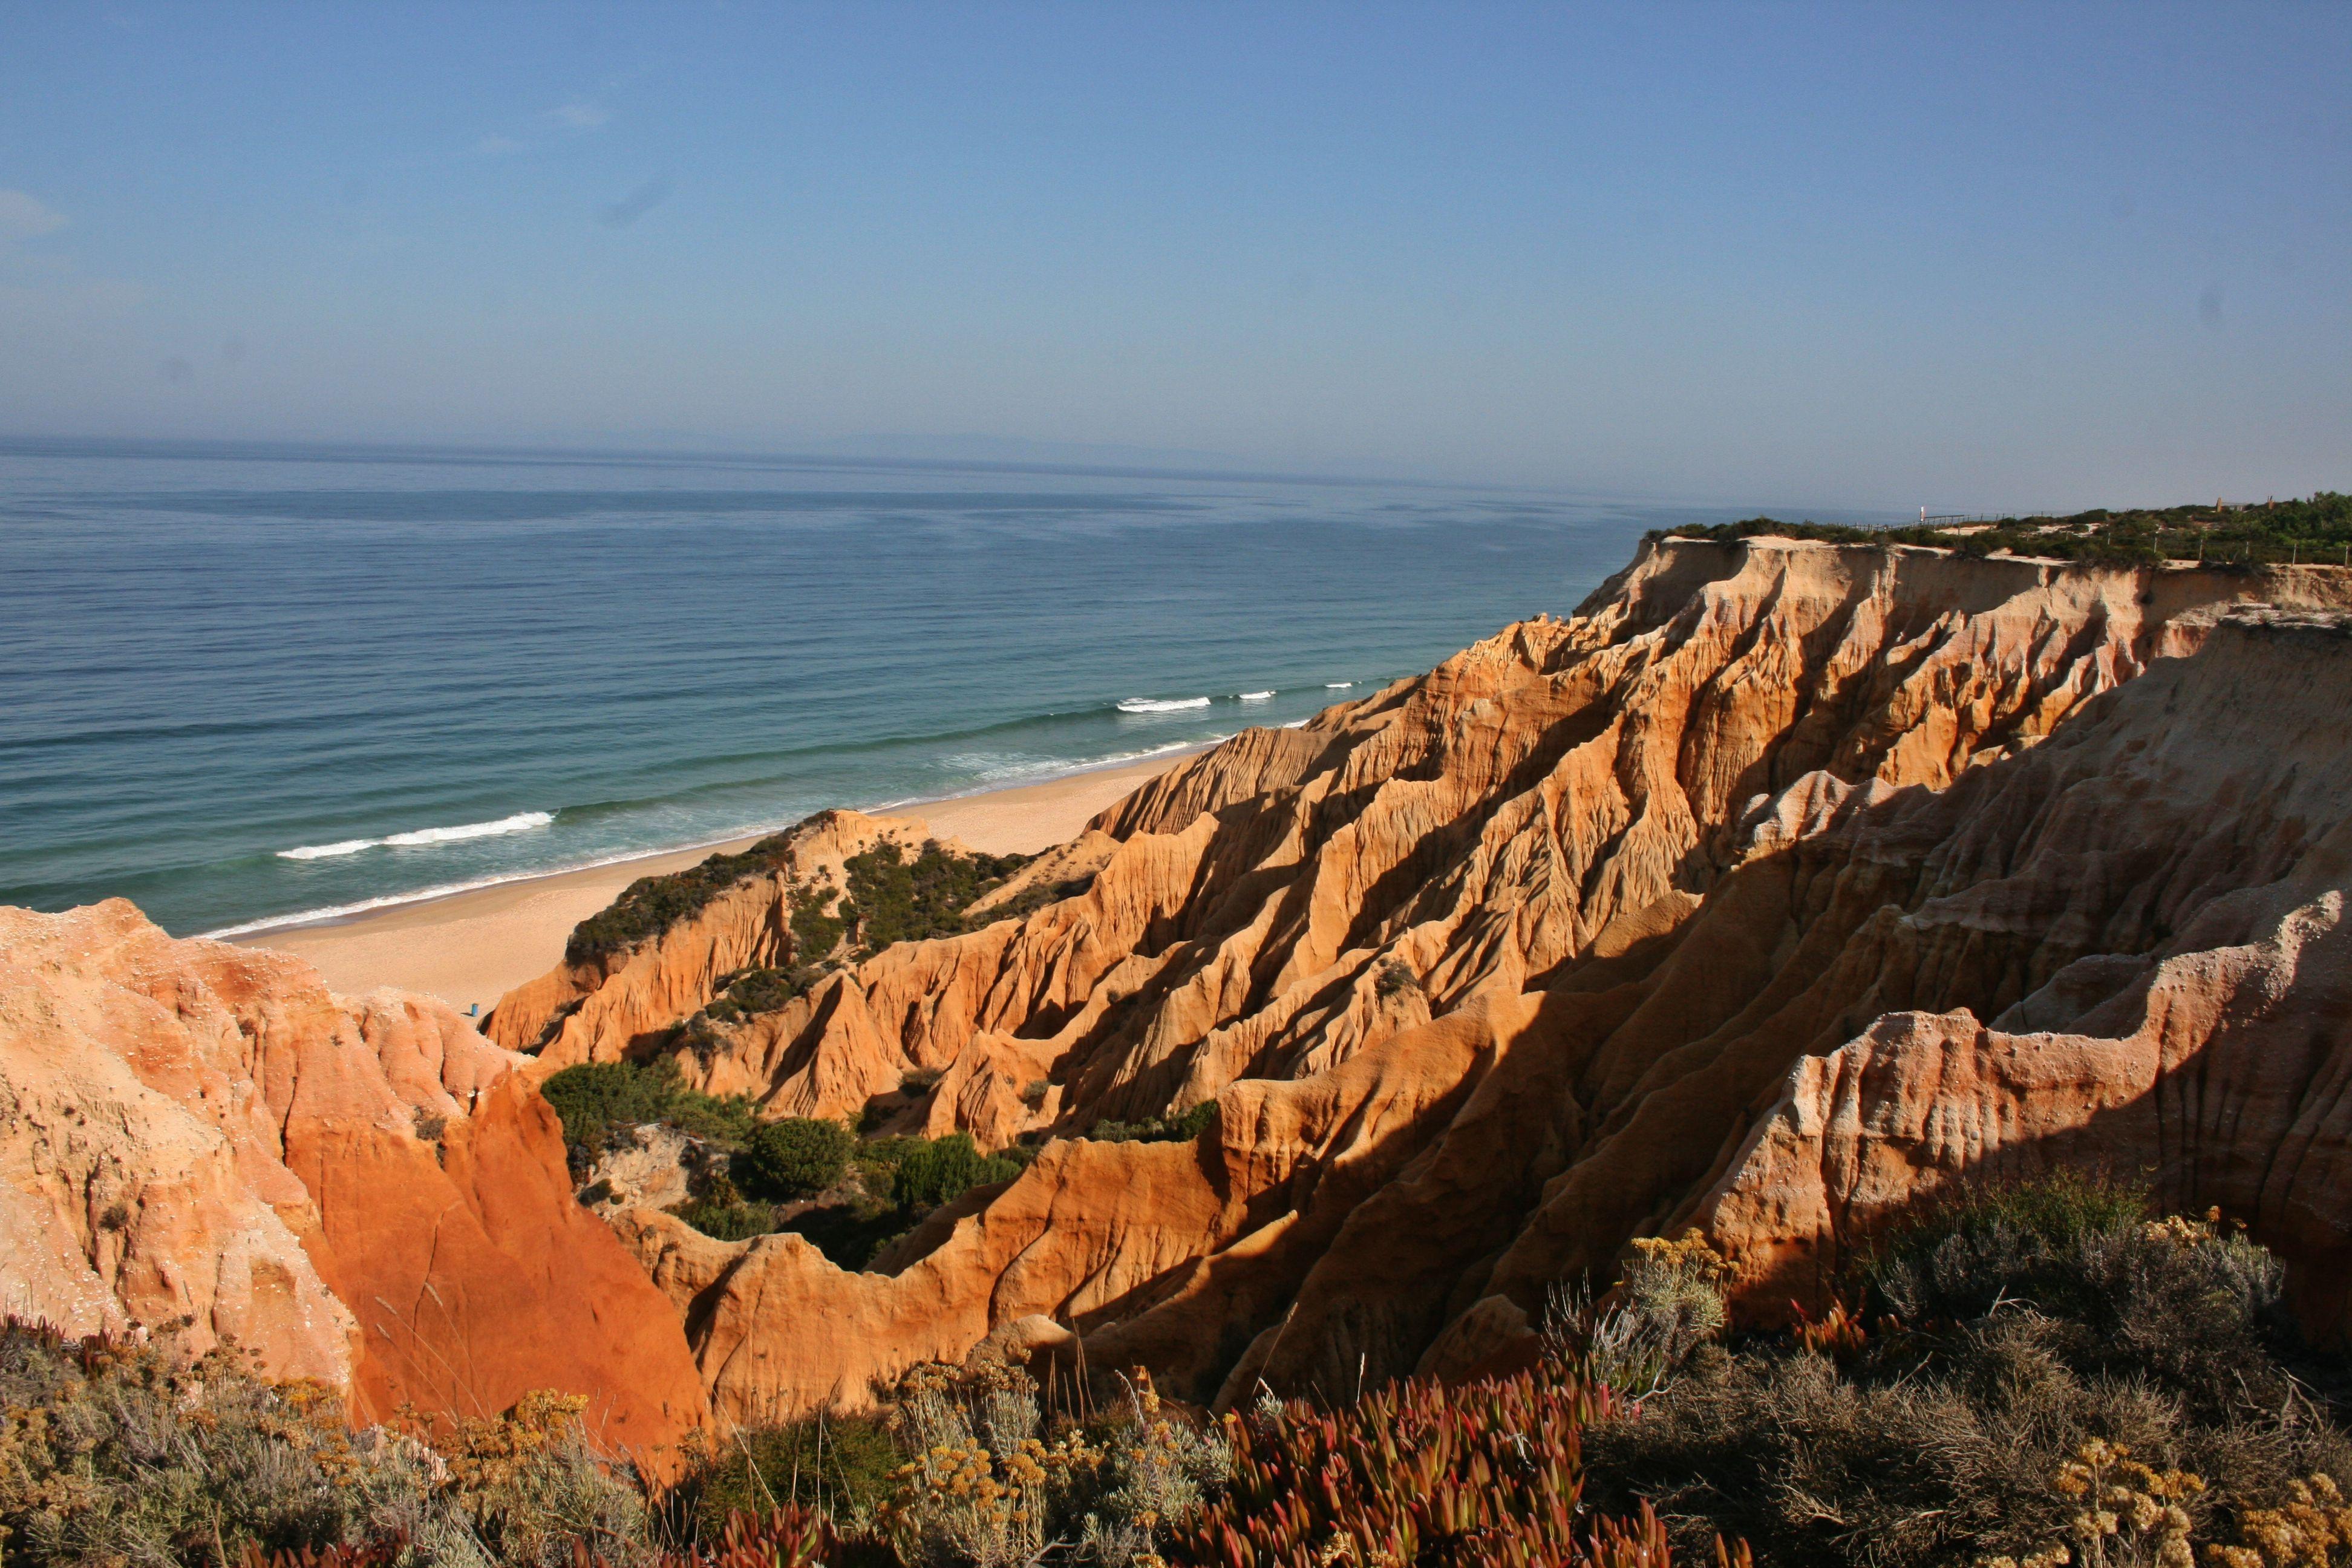 Praia-fontainhas-alentejo-costa-melides-grandola